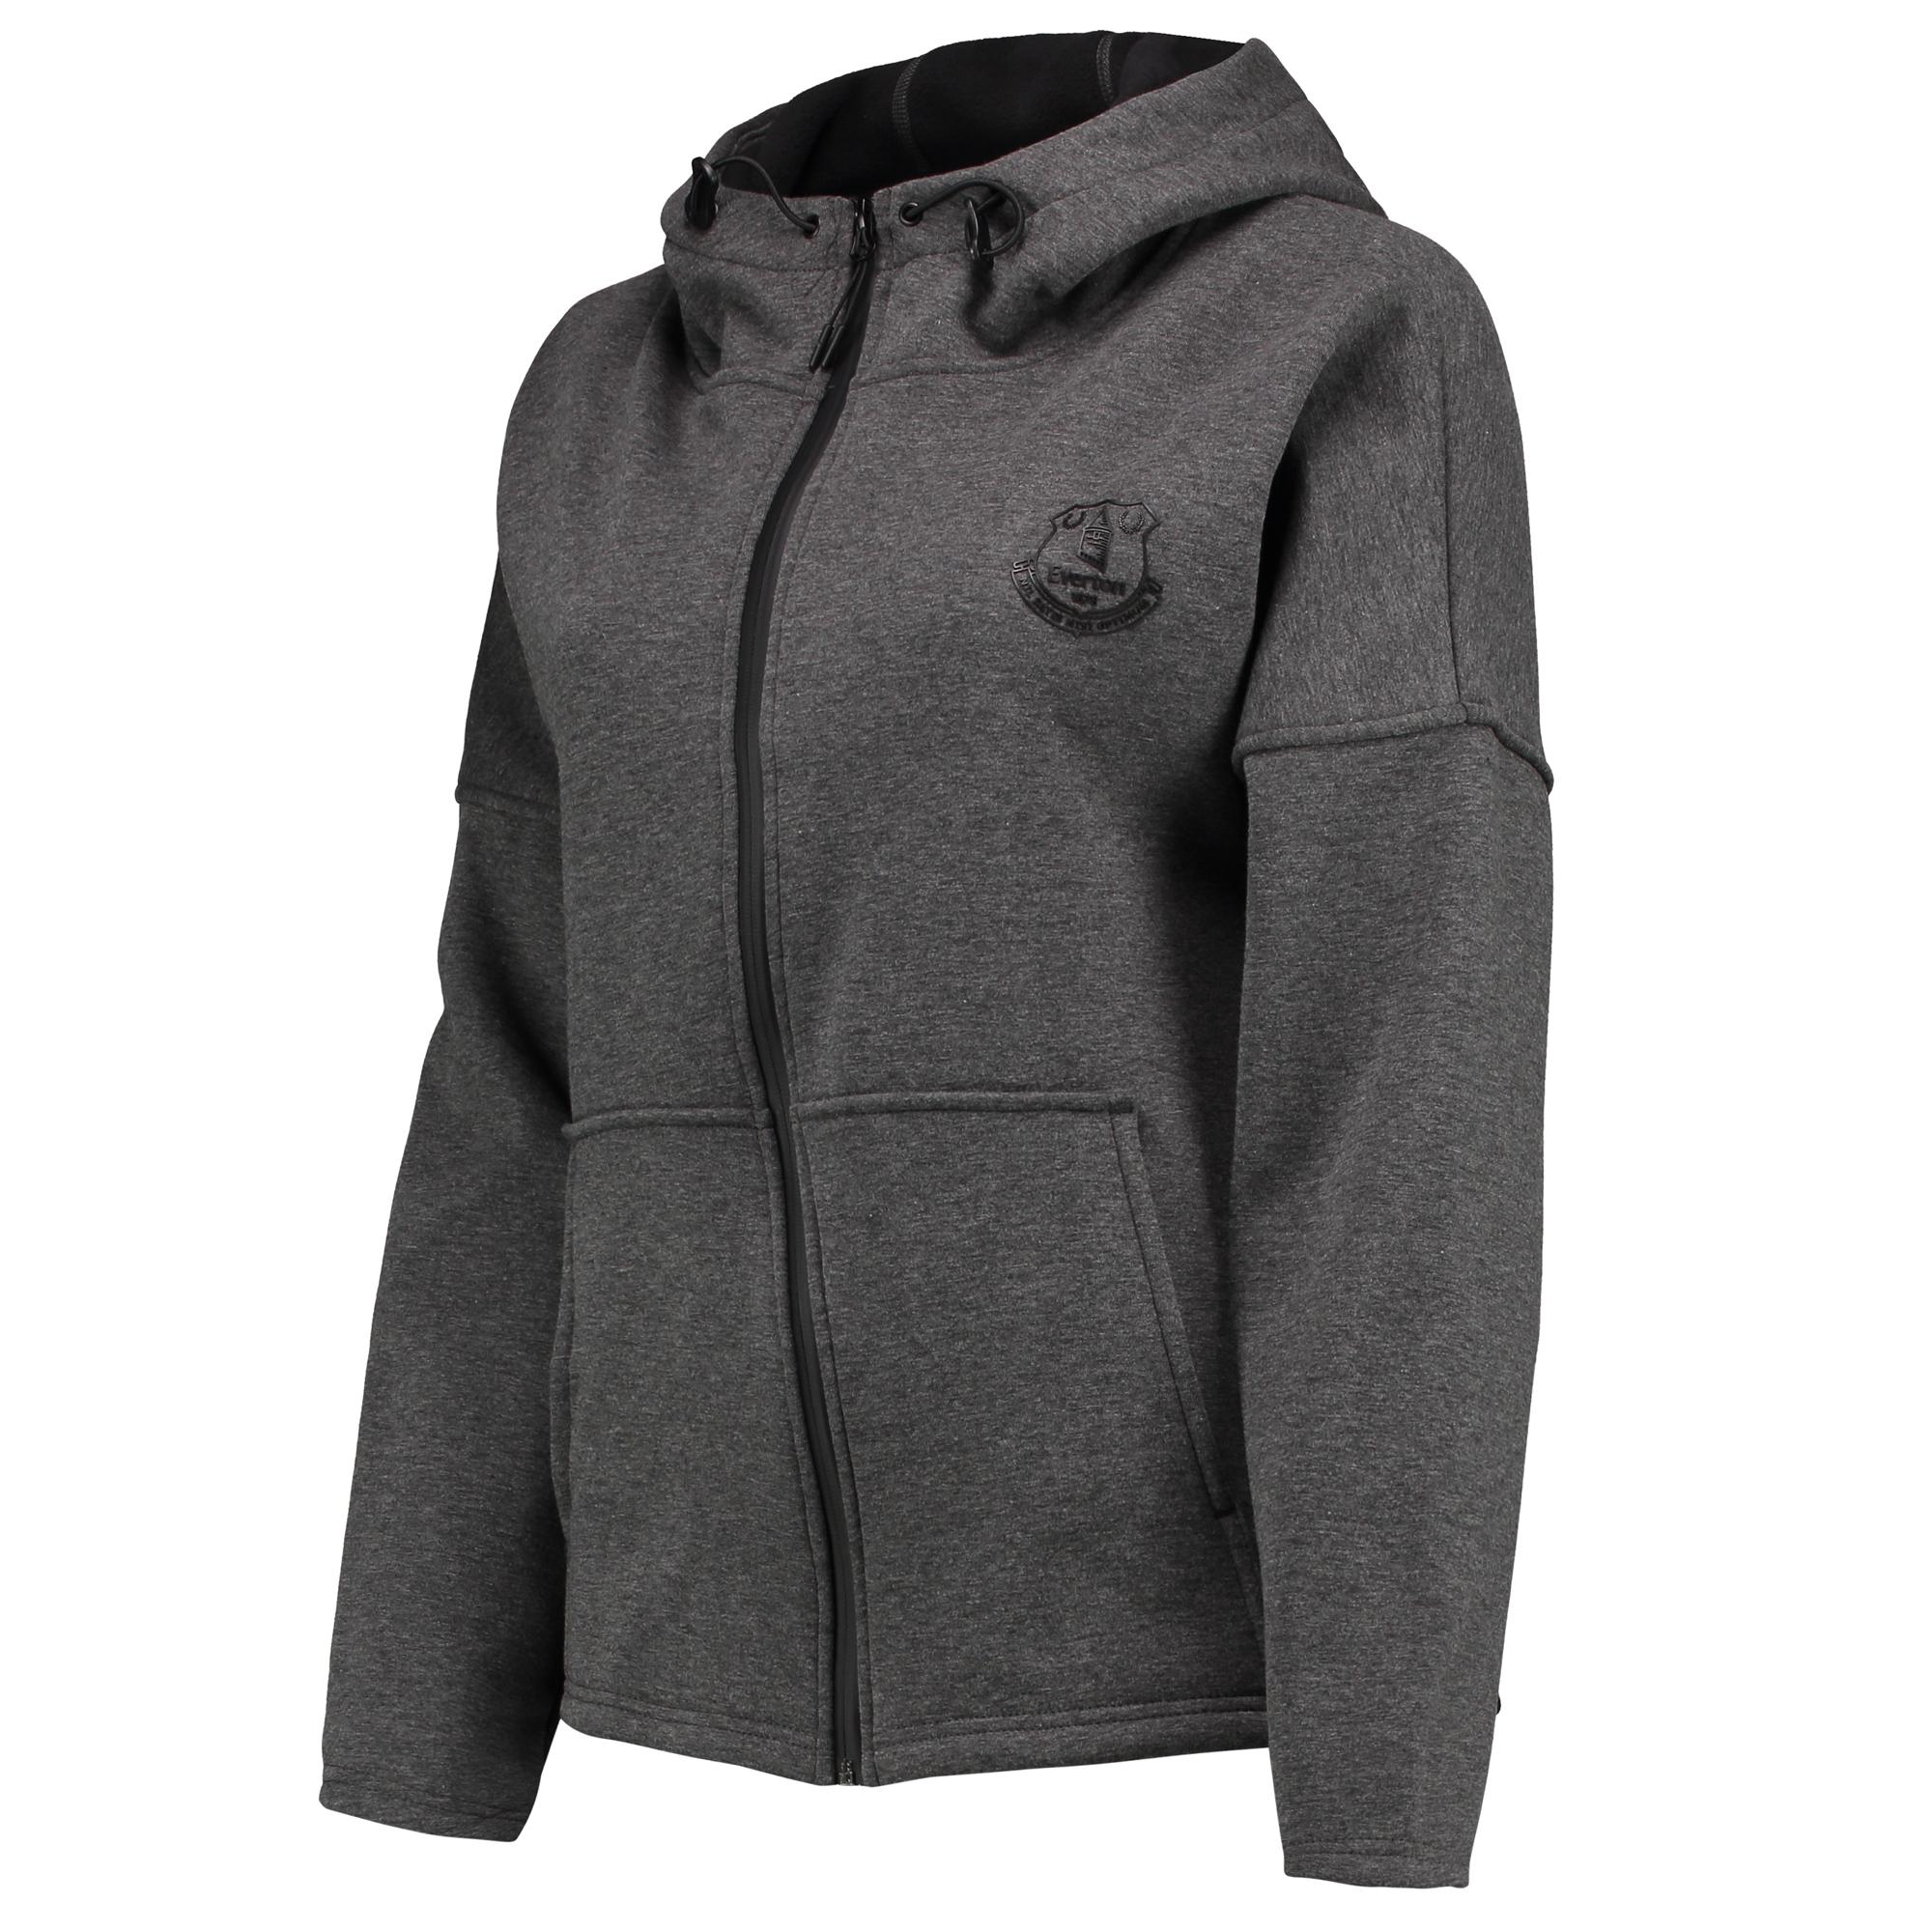 Image of Everton Ath Tech Fleece FZ Hoodie - Charcoal Marl - Womens